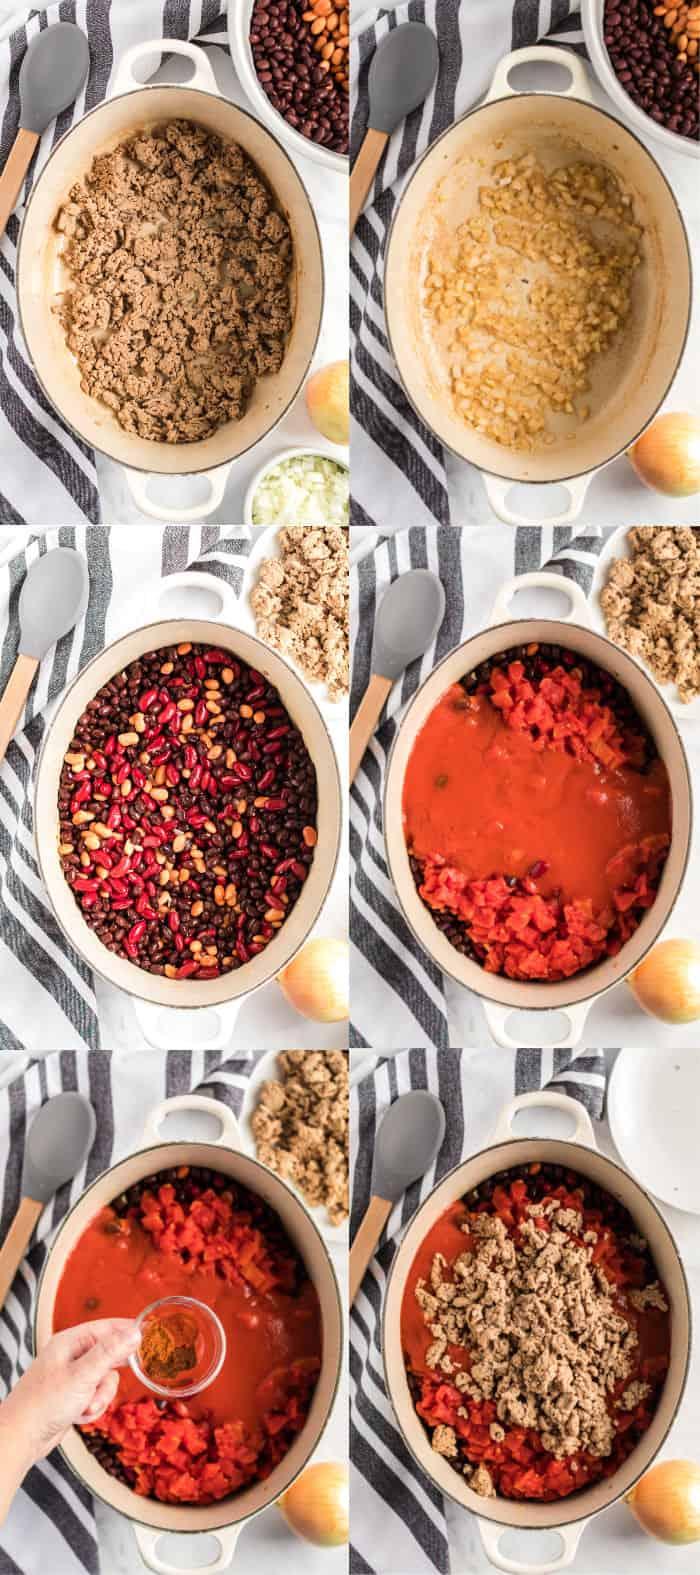 steps to make turkey chili